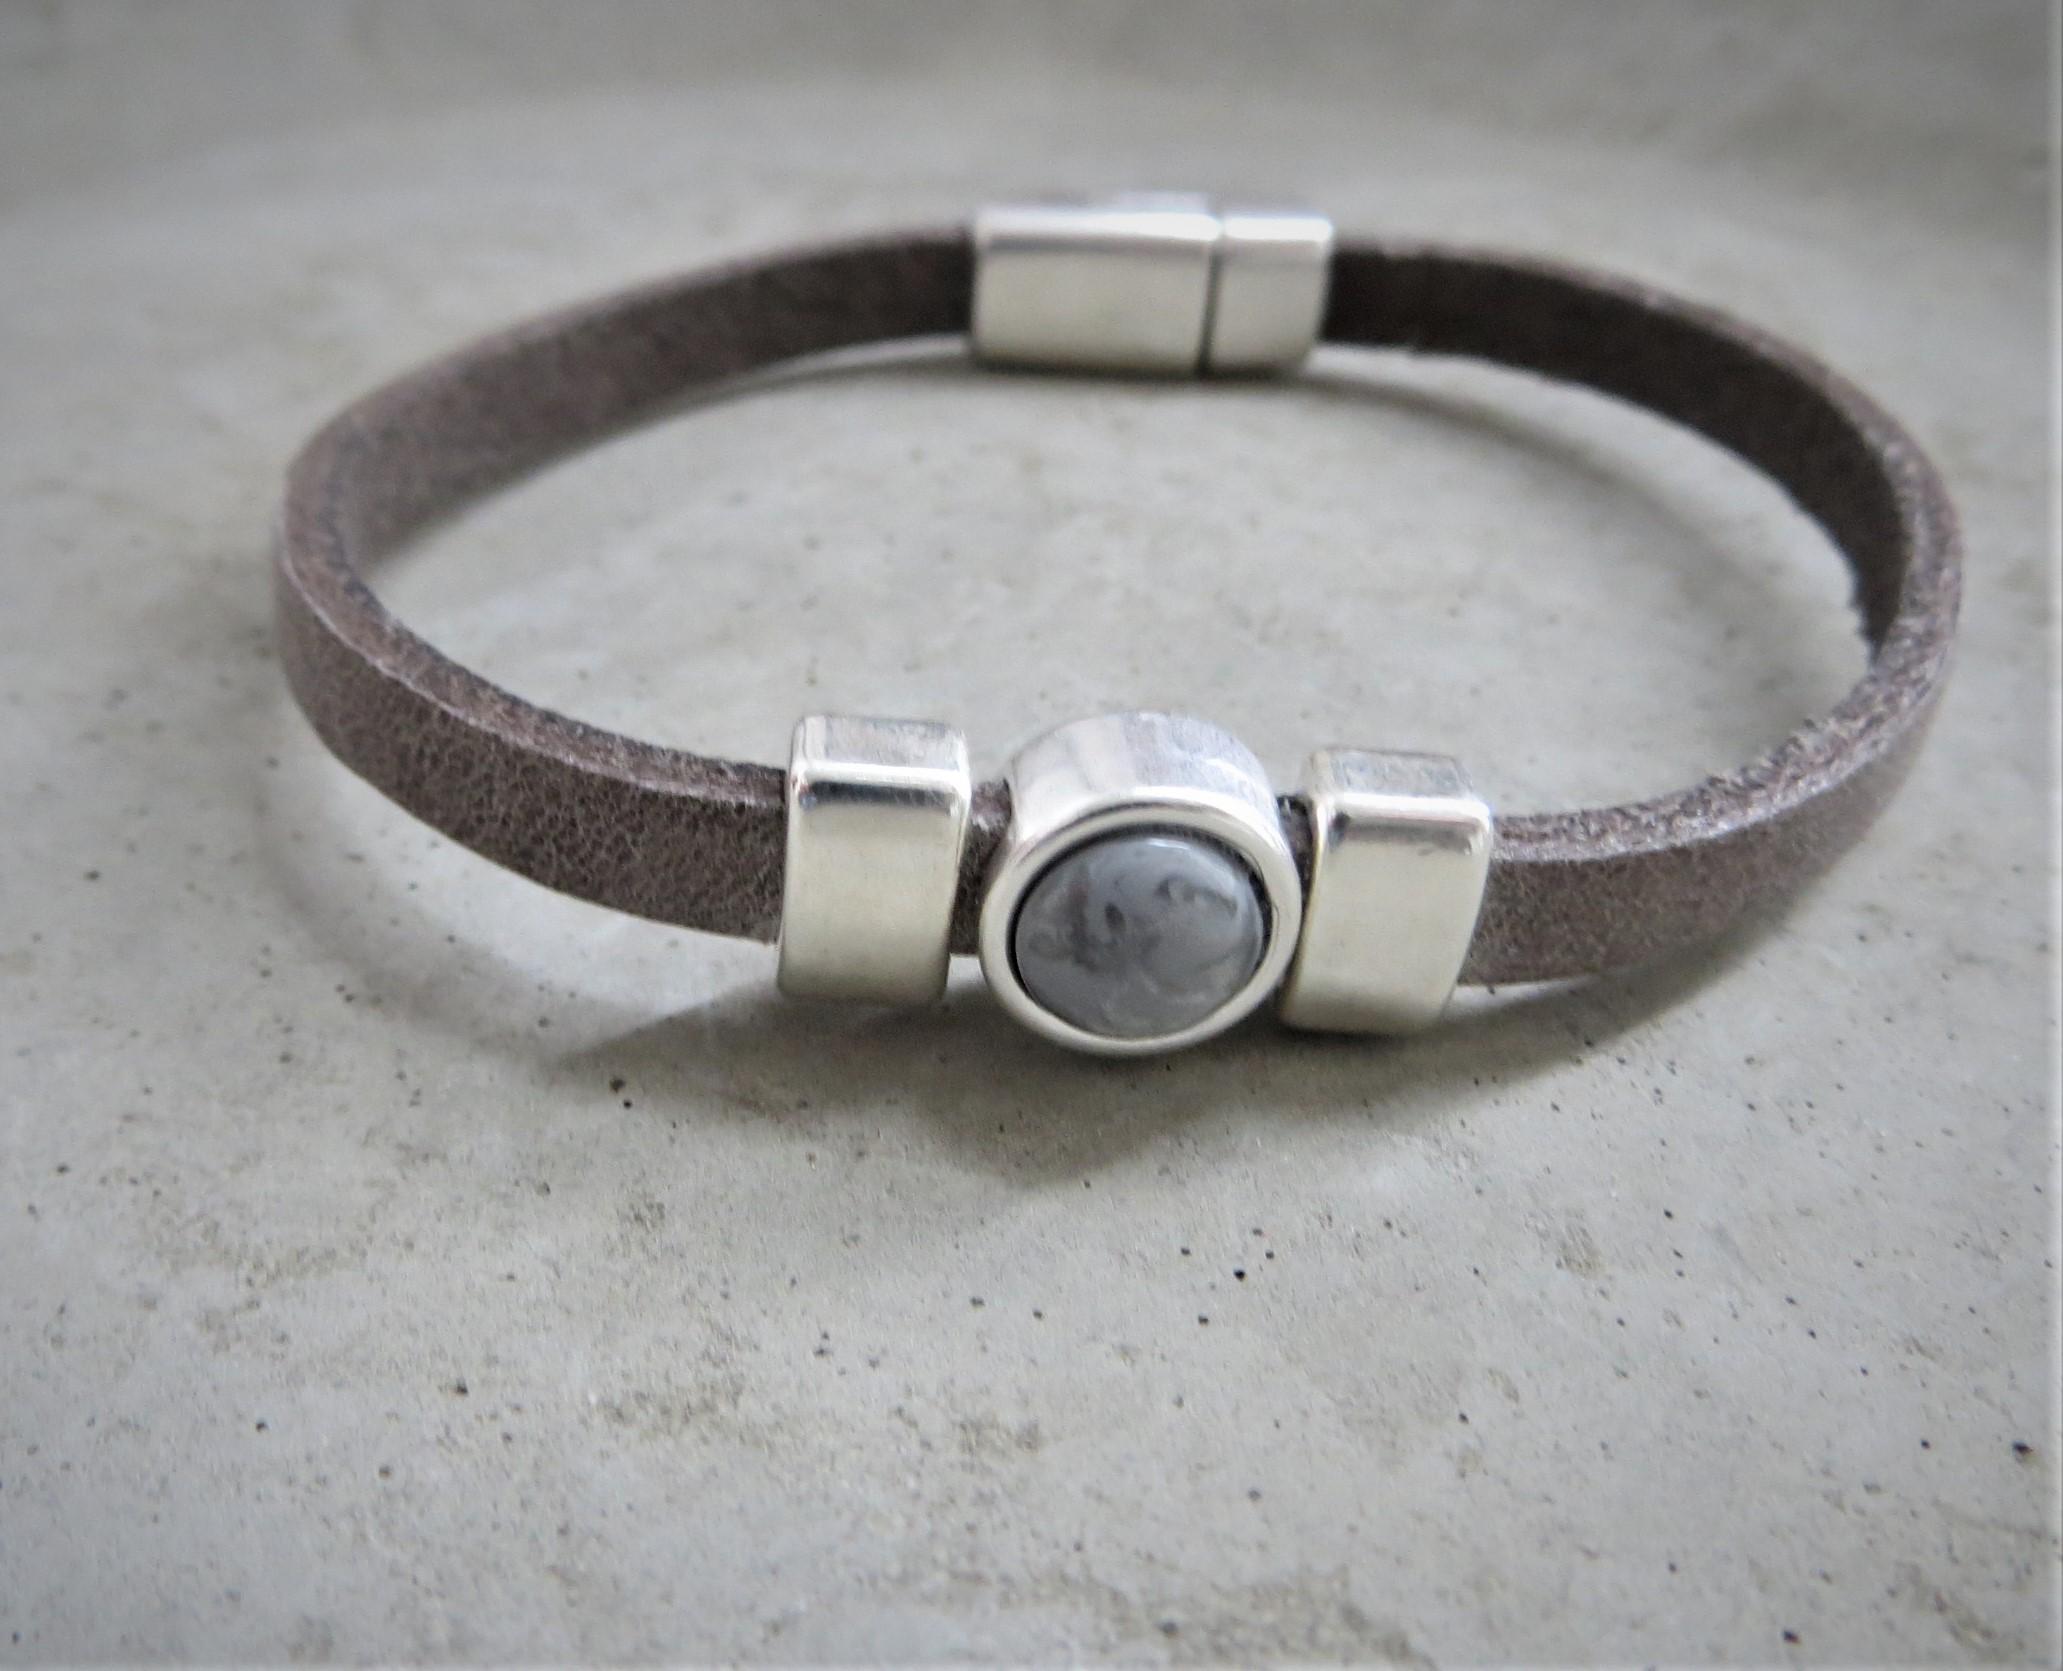 Armbaender für Frauen - QOSS Armband CHARLOTTE Grau M  - Onlineshop Tante Emmer